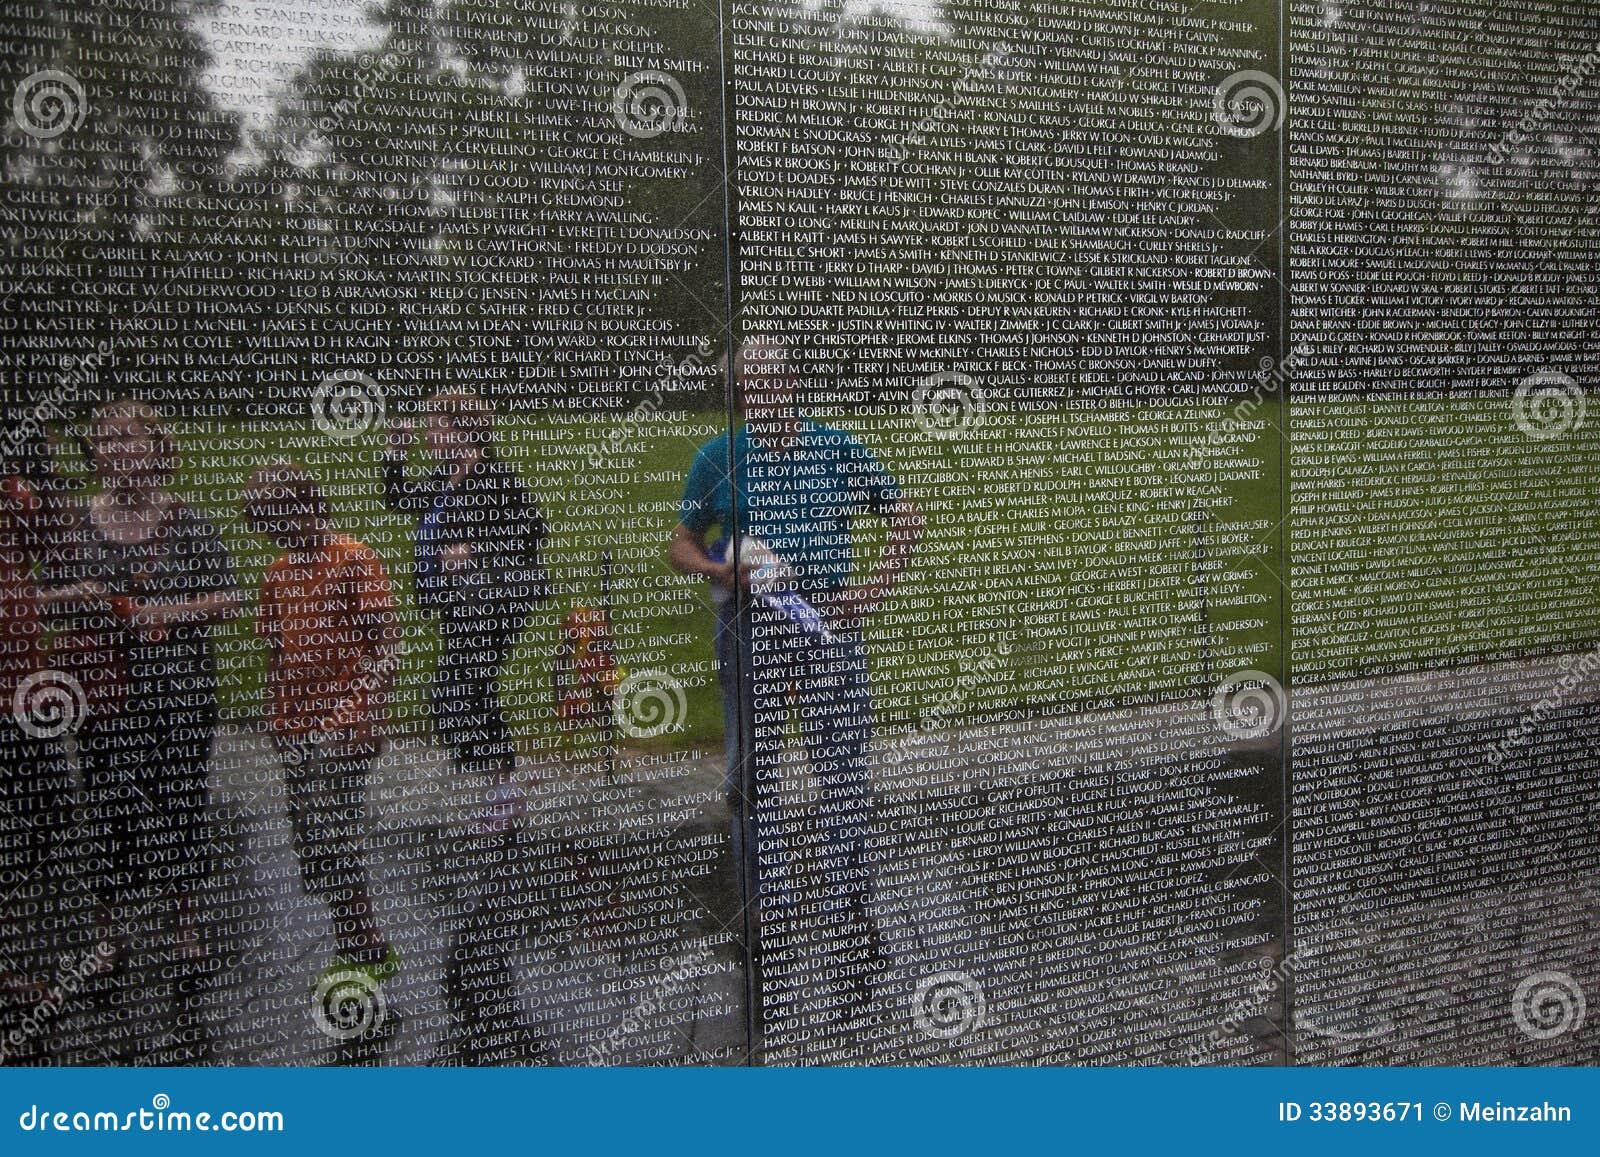 Nombres de las muertes de la guerra de Vietnam encendido